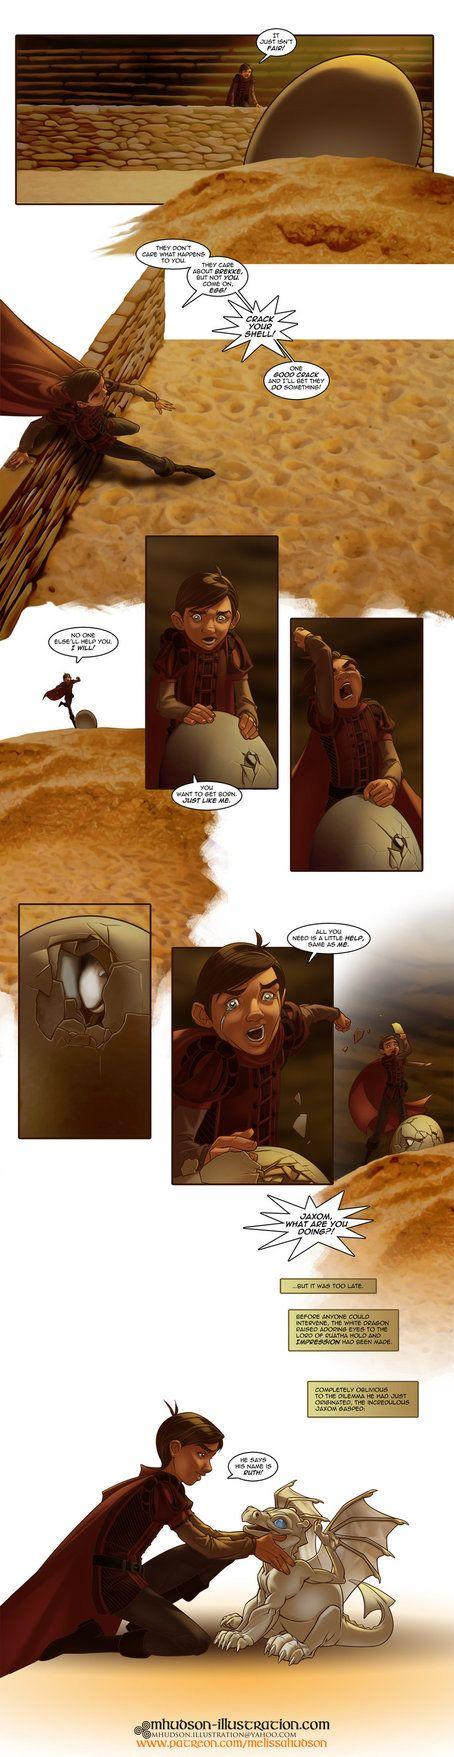 The Impression Dragonriders of Pern fancomic pg12 by MMHudson.deviantart.com on @DeviantArt